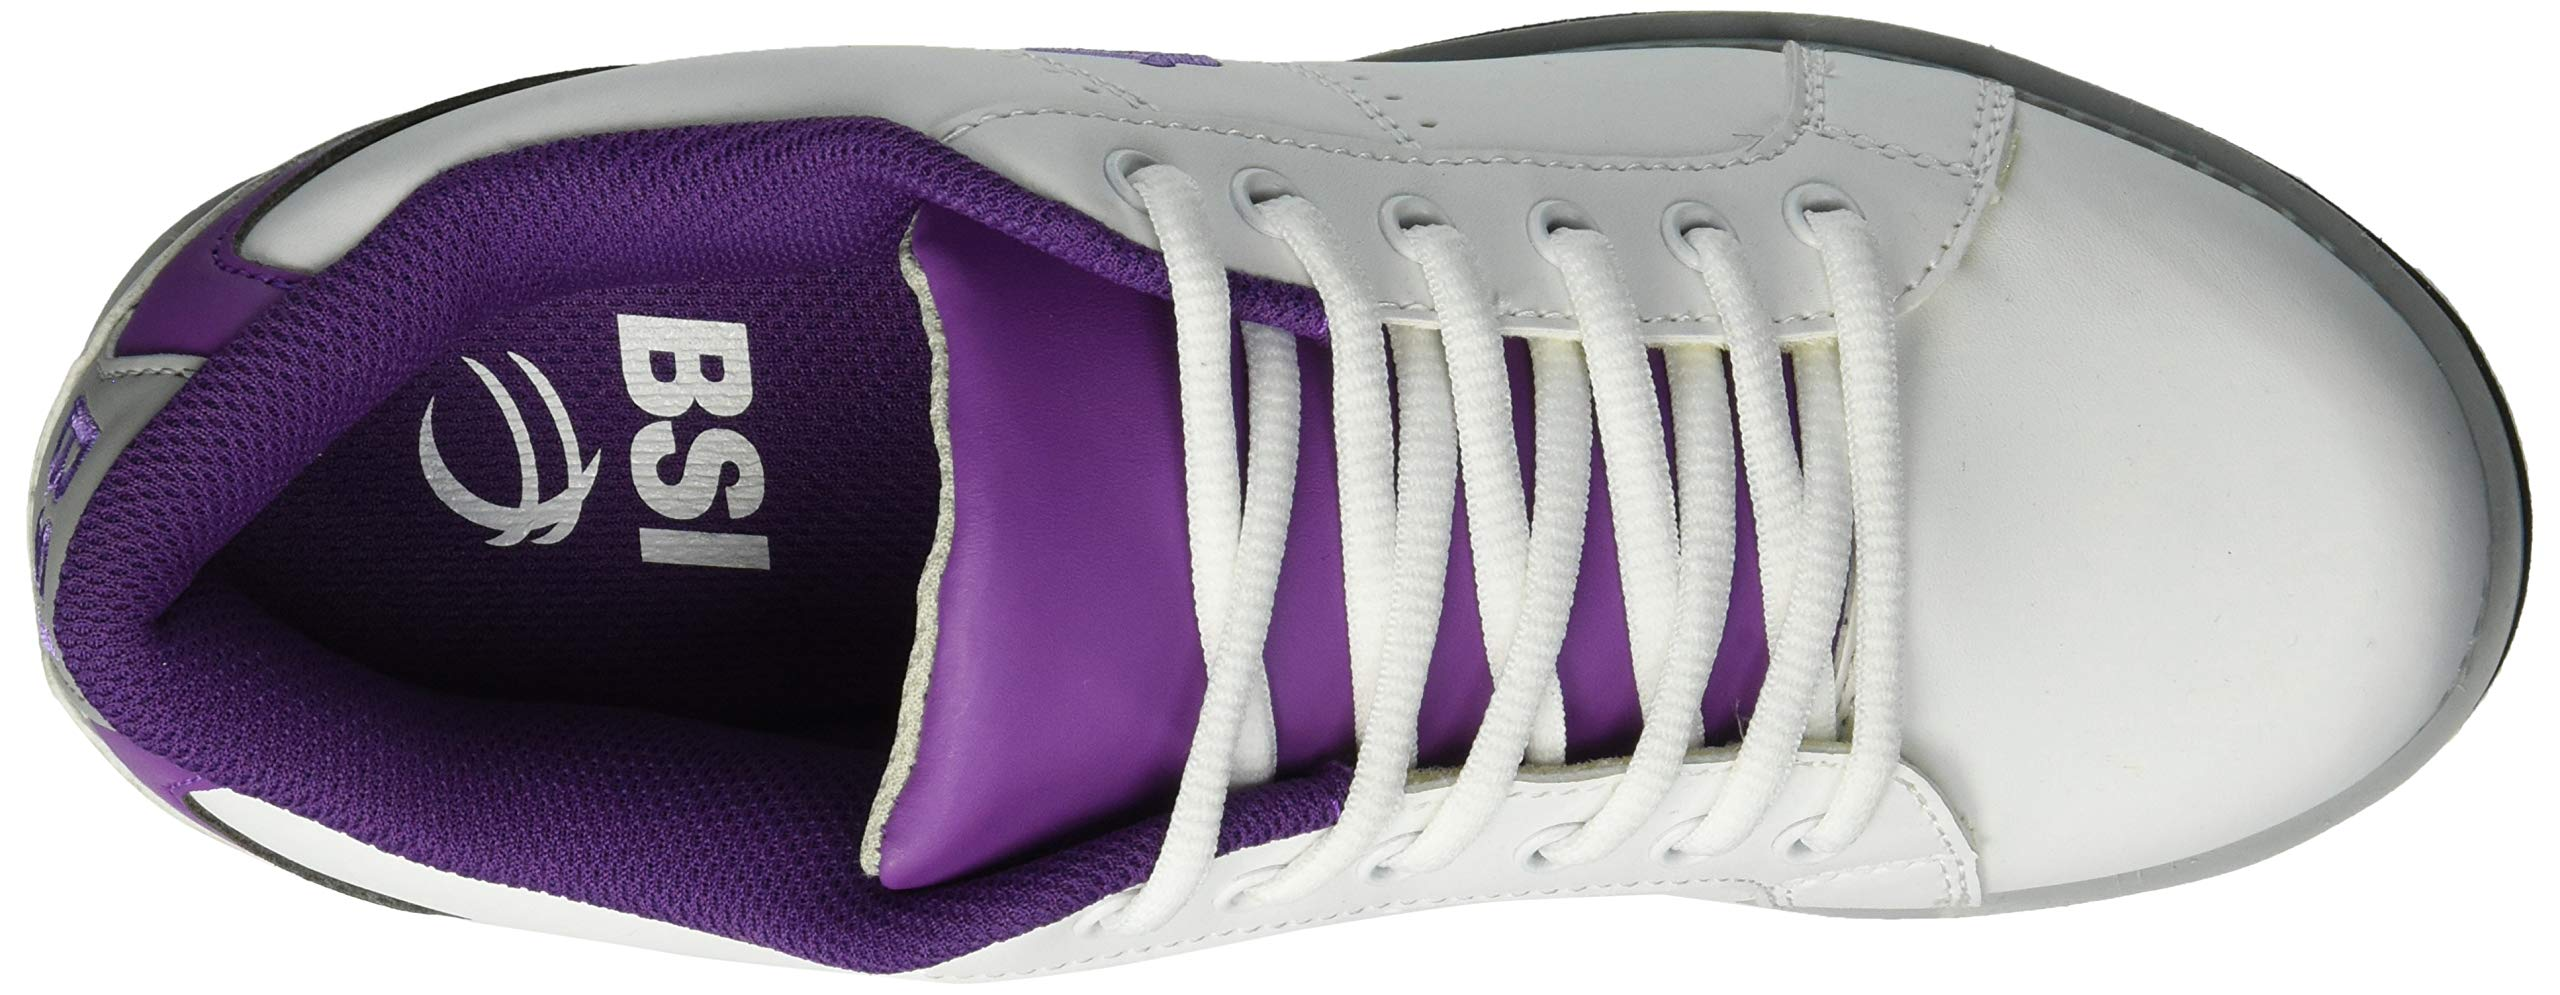 BSI Women's 460 Bowling Shoe, White/Purple, Size 10 by BSI (Image #8)